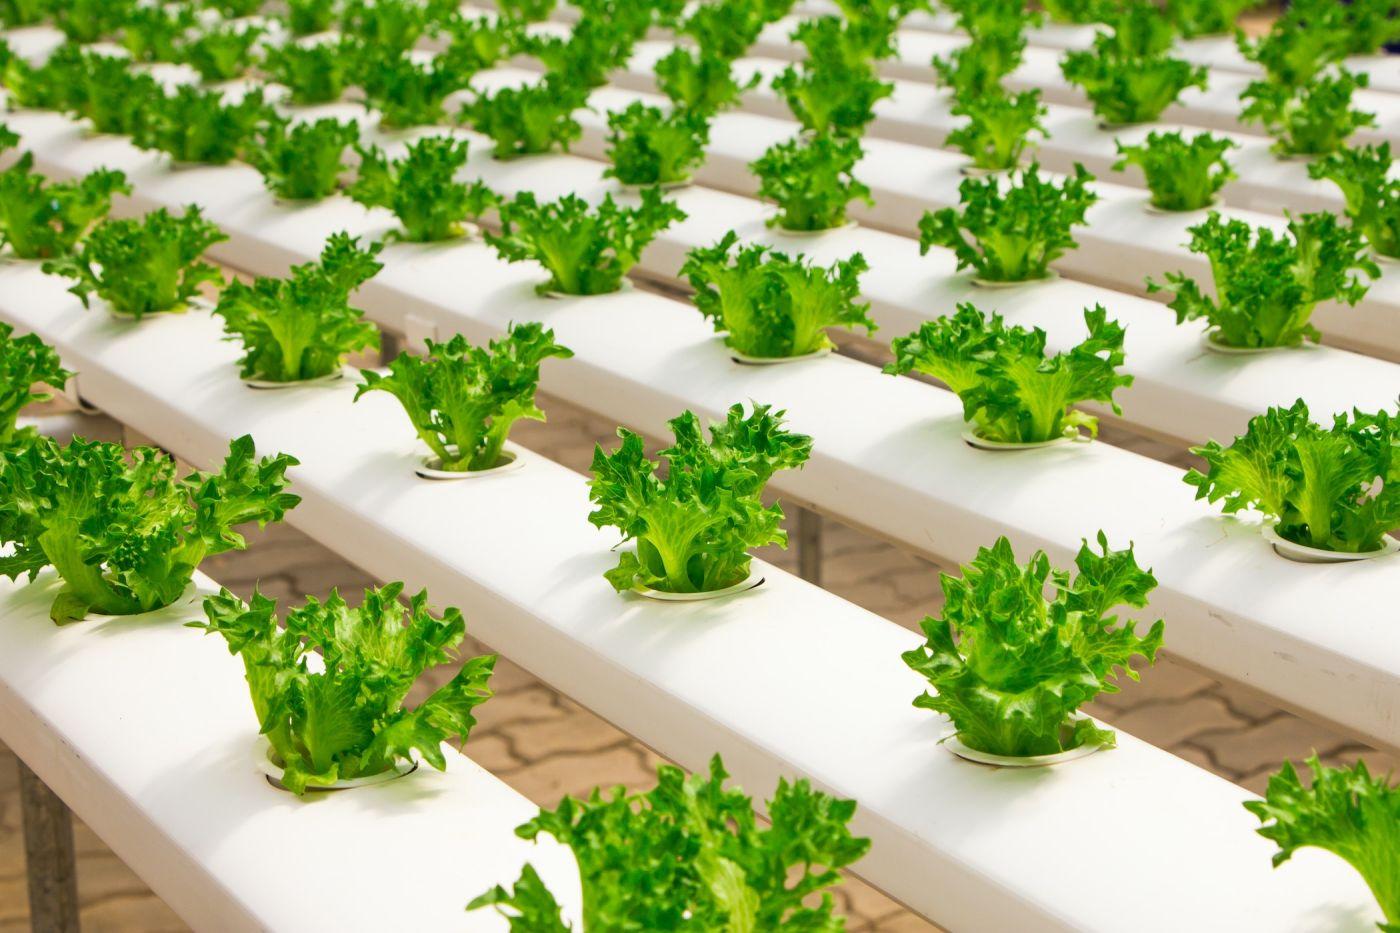 Vertical Farming, Zukunft, Nachhaltigkeit, organic farming, urban farming